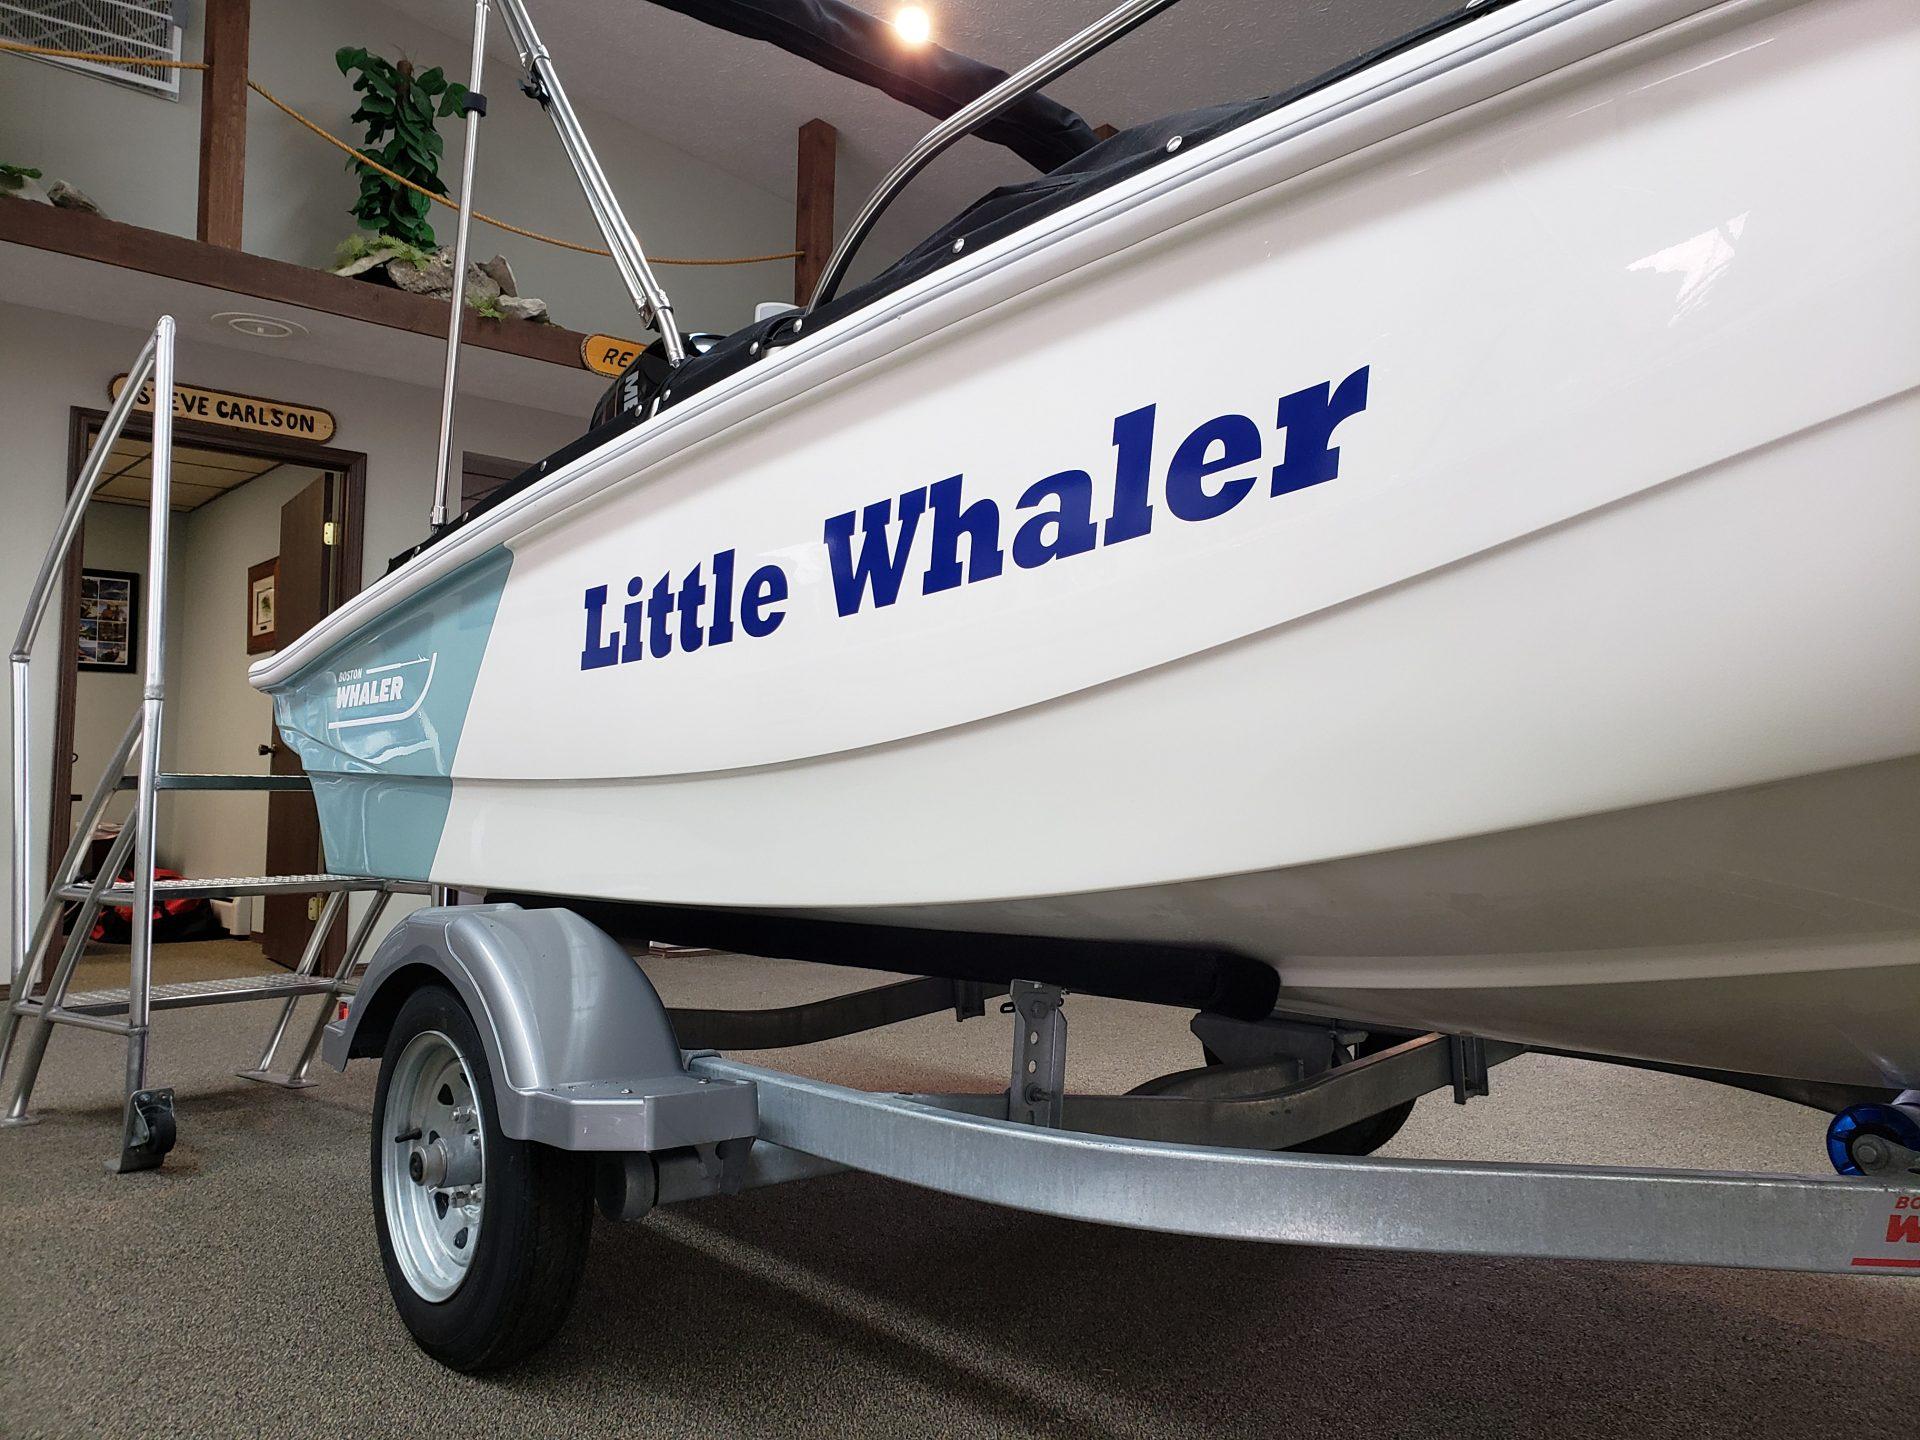 Little Whaler